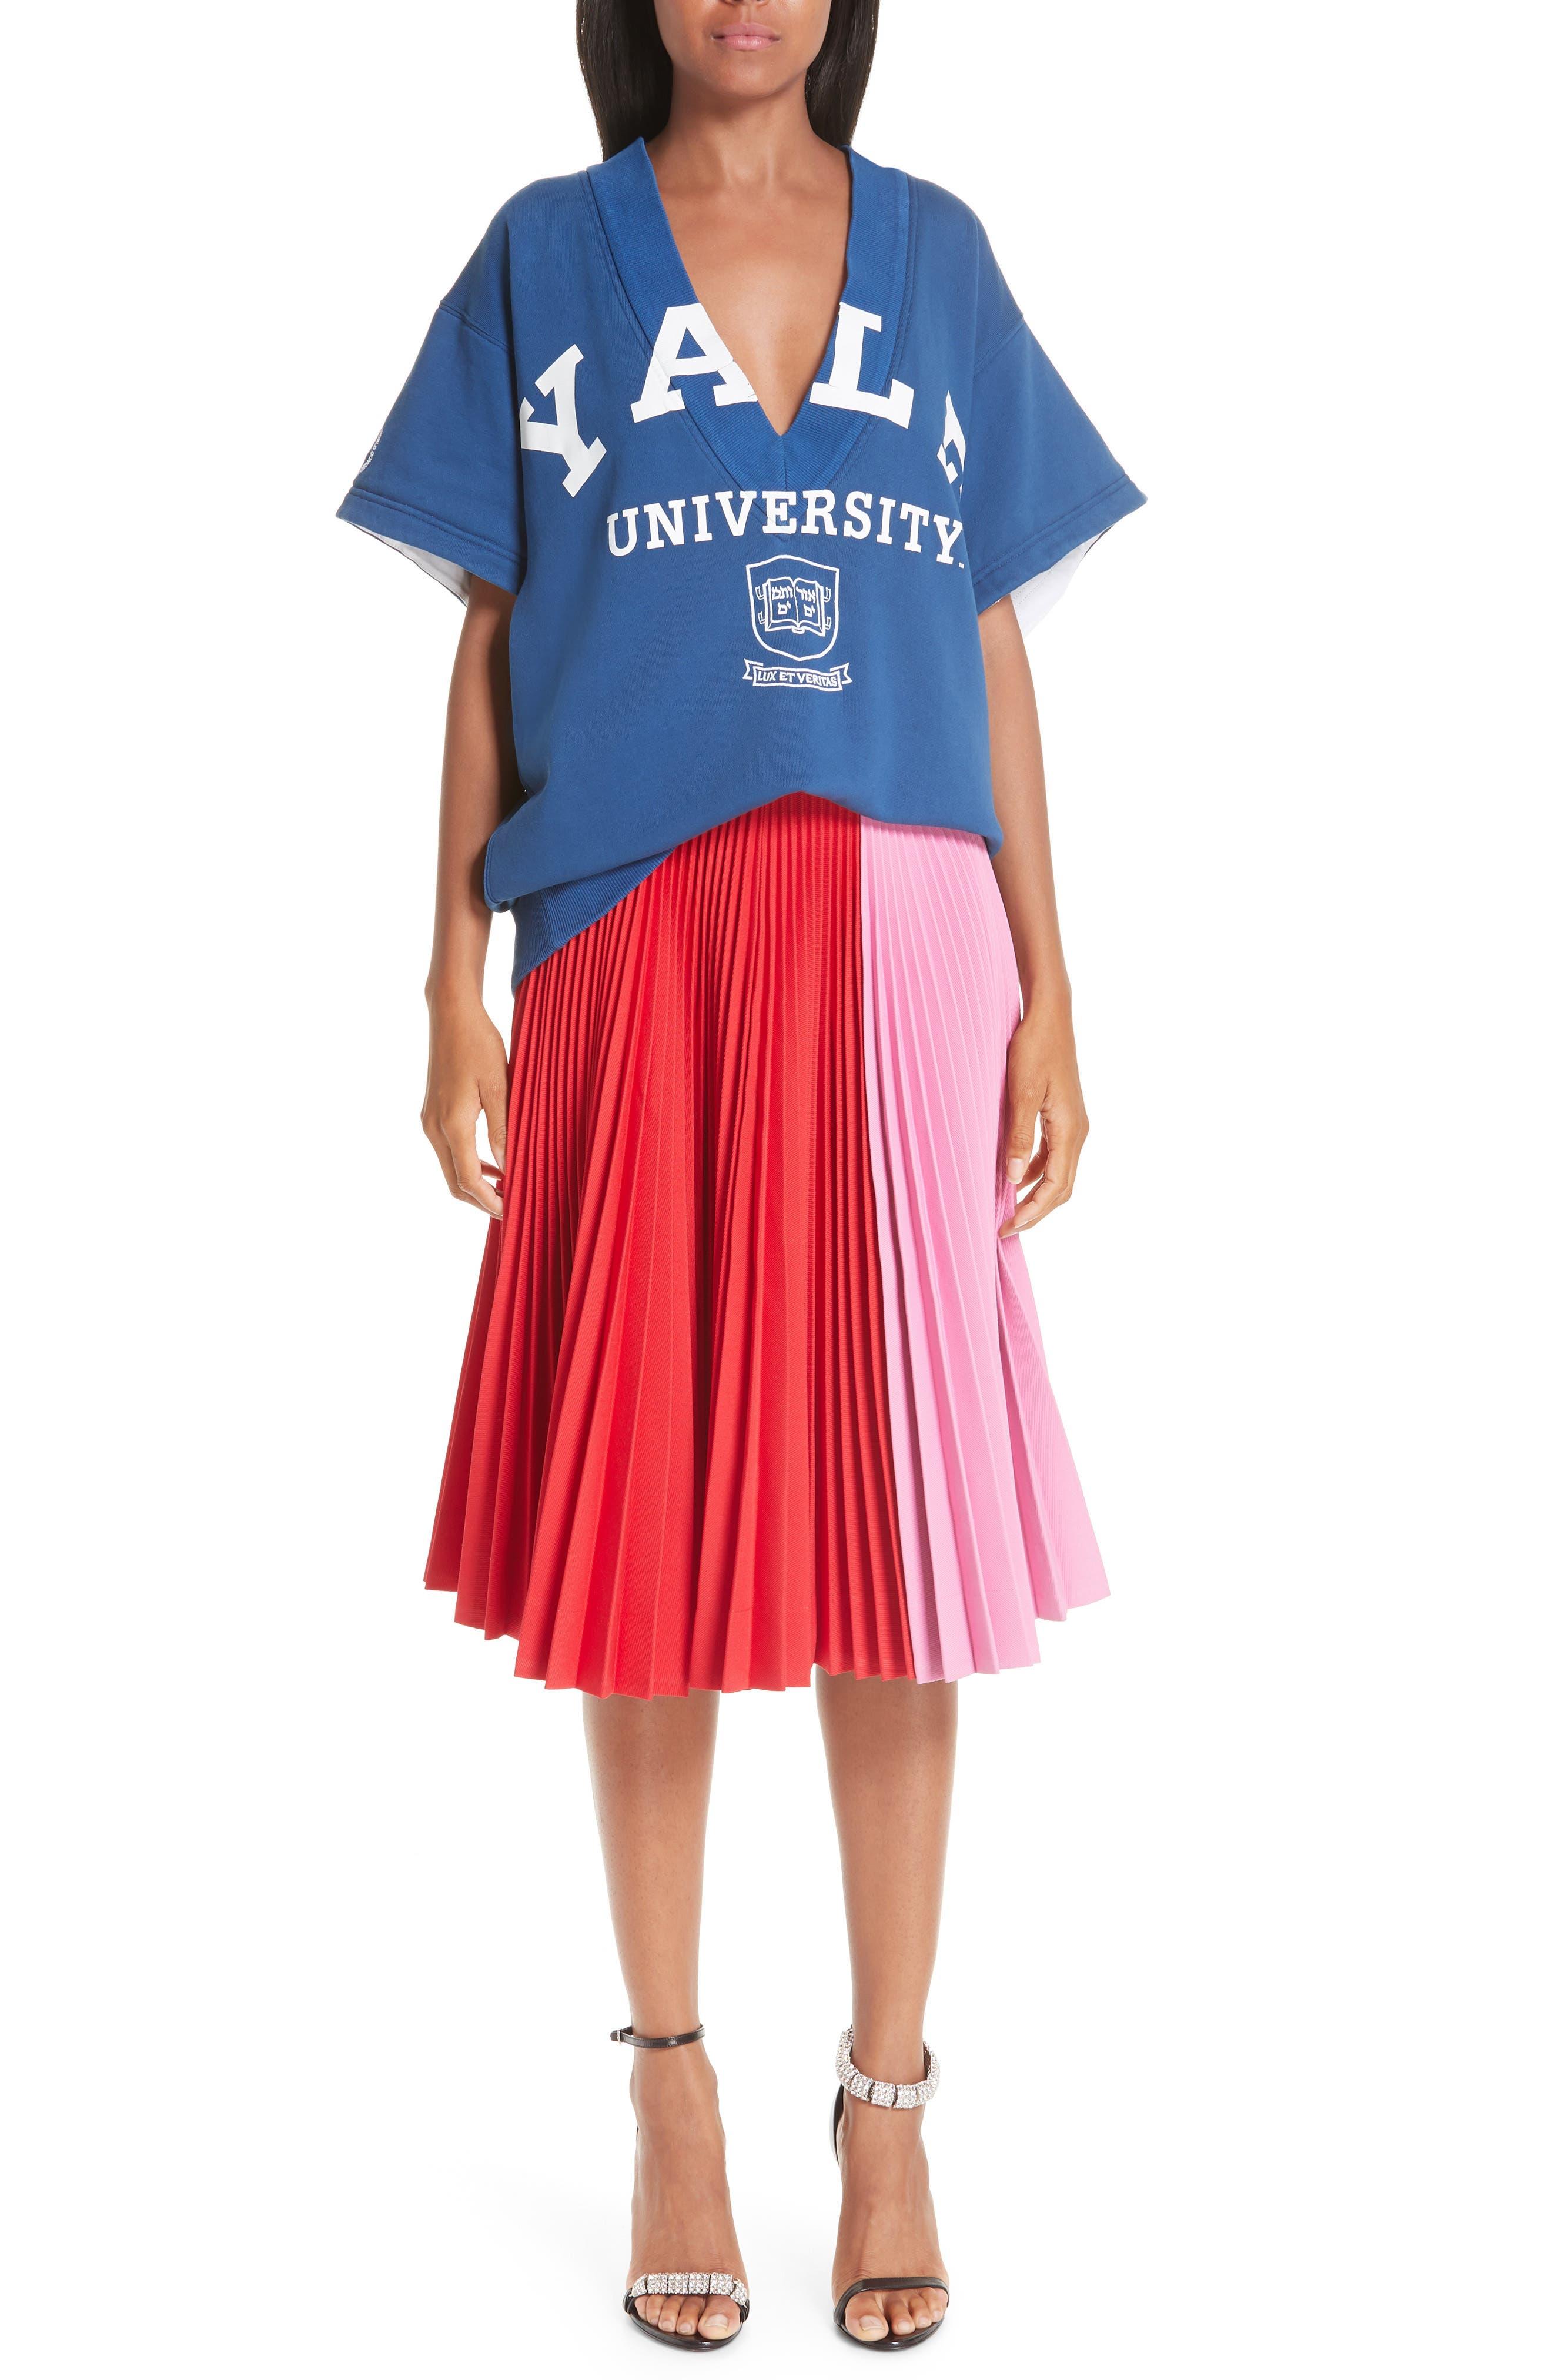 CALVIN KLEIN 205W39NYC, Yale Short Sleeve Sweatshirt, Alternate thumbnail 8, color, YALE BLUE